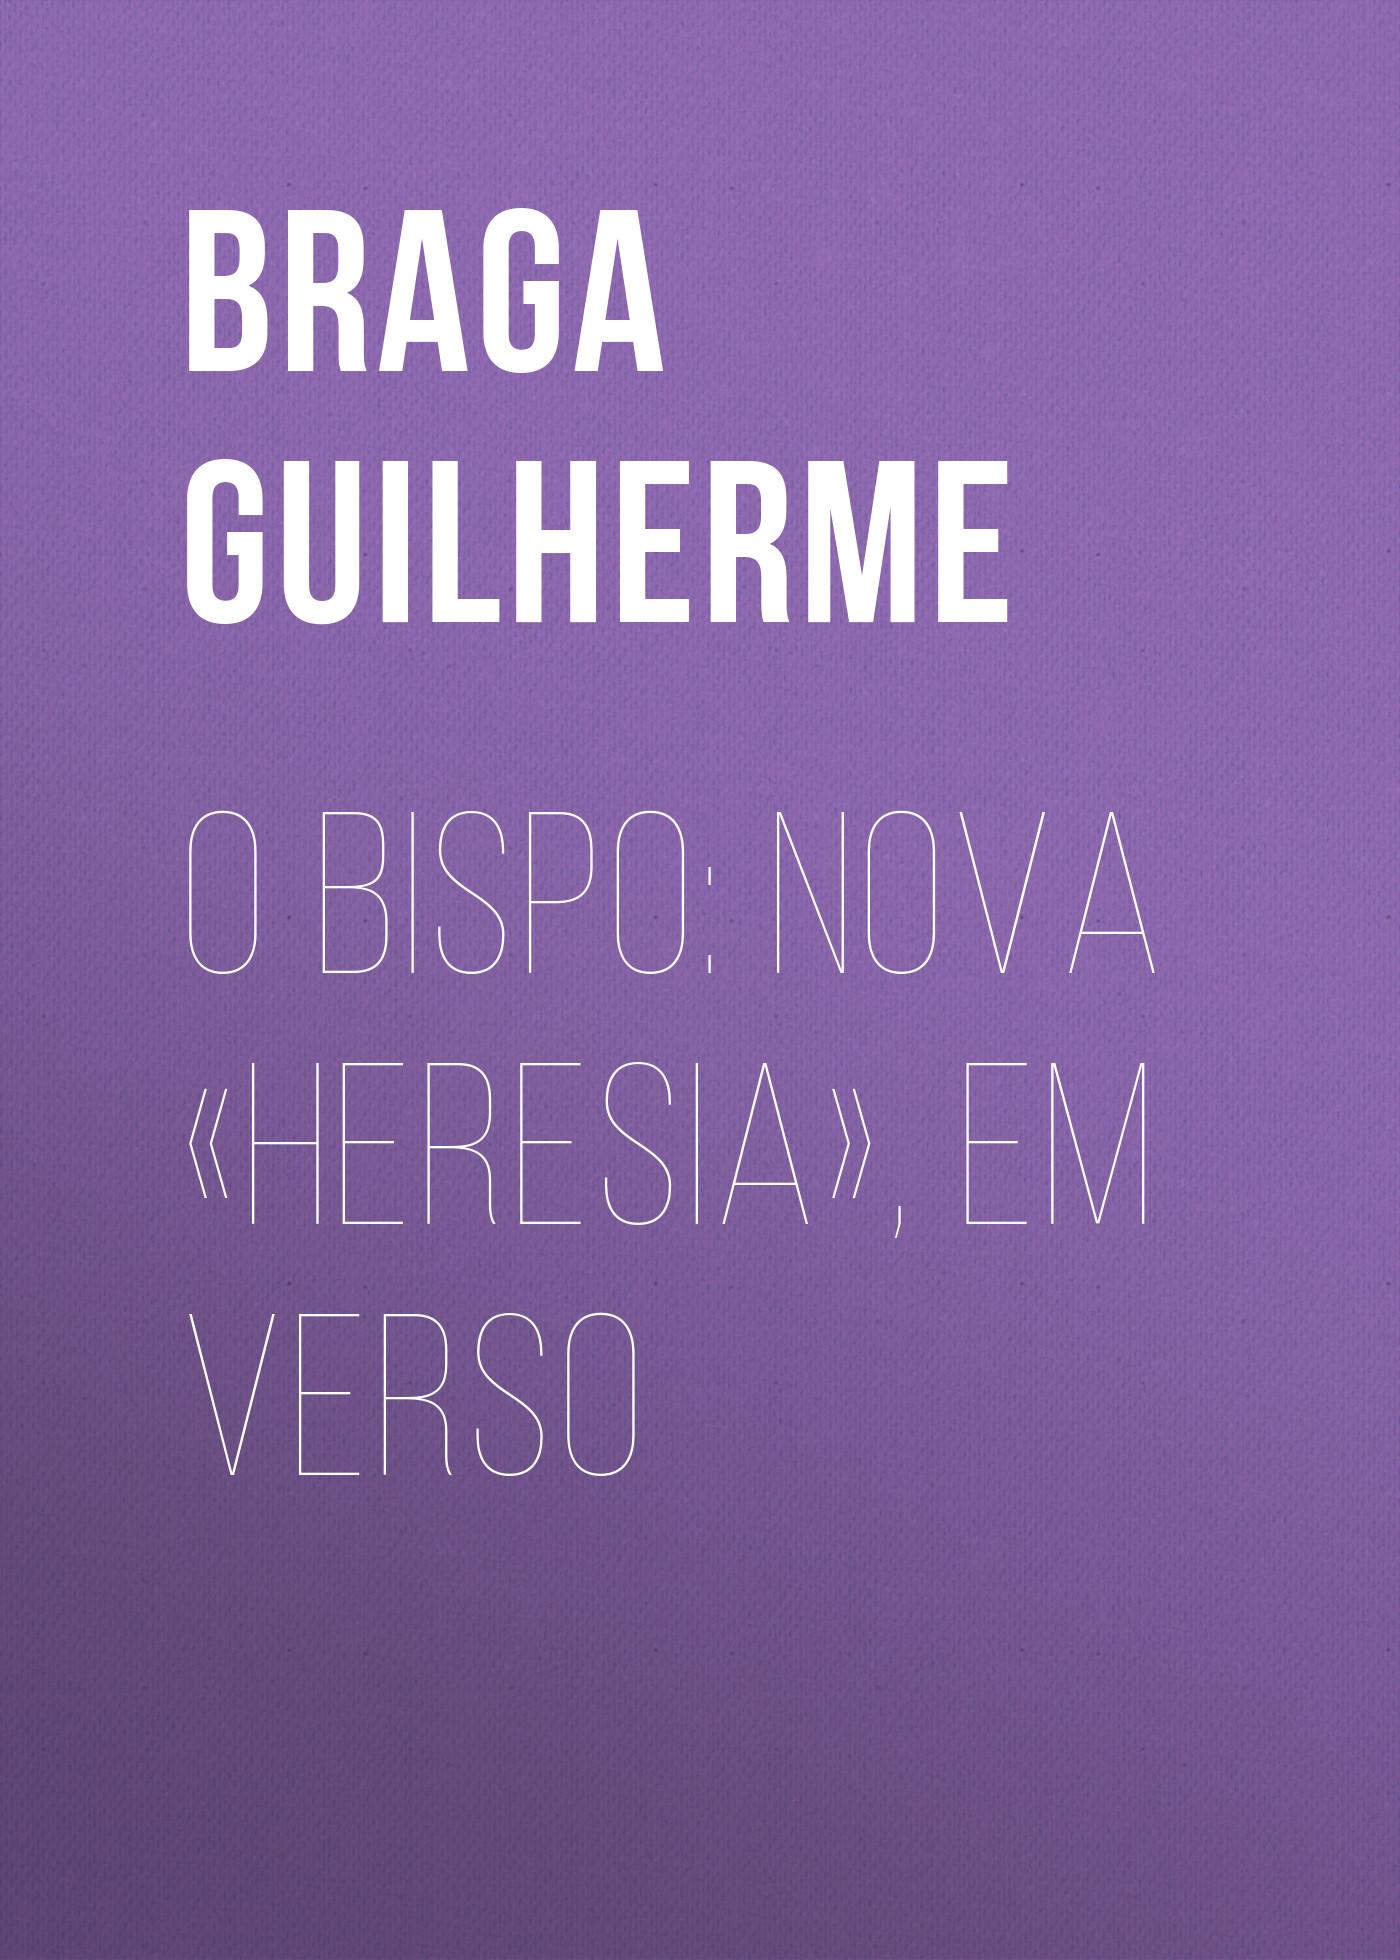 Braga Guilherme O Bispo: Nova «Heresia», em verso цены онлайн